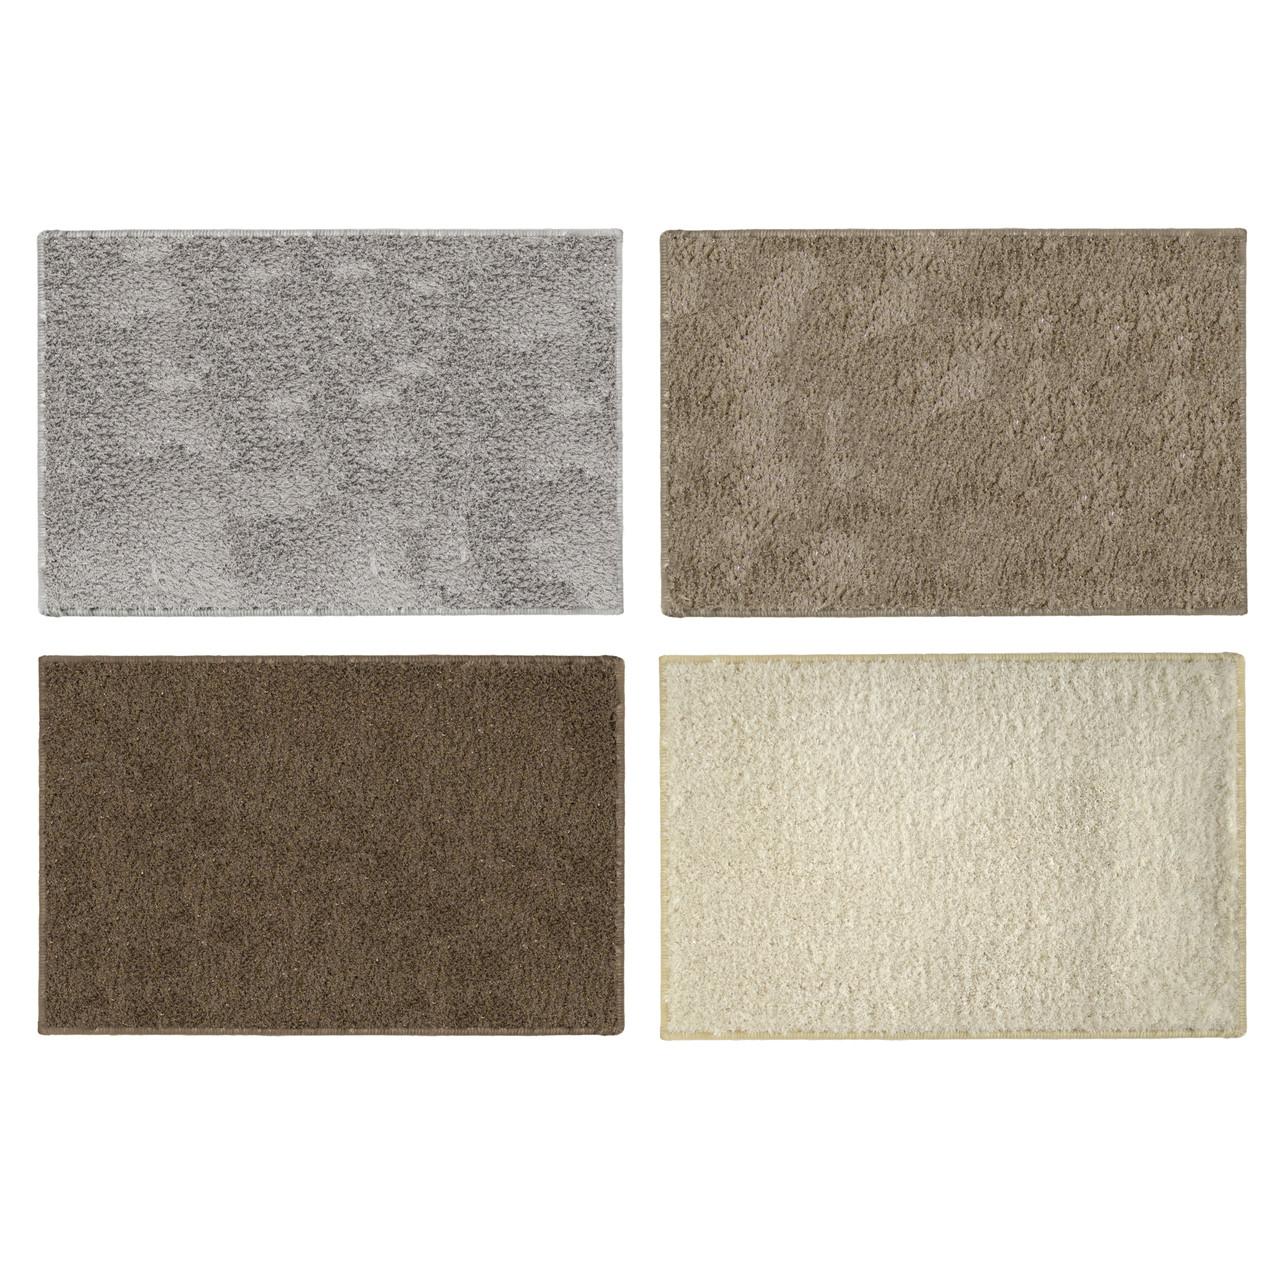 Spen Luxury Decorative Glitter Lurex Blend Bath Mat Bathroom Floor Rug Anti Slip Backing 20x30 Inch